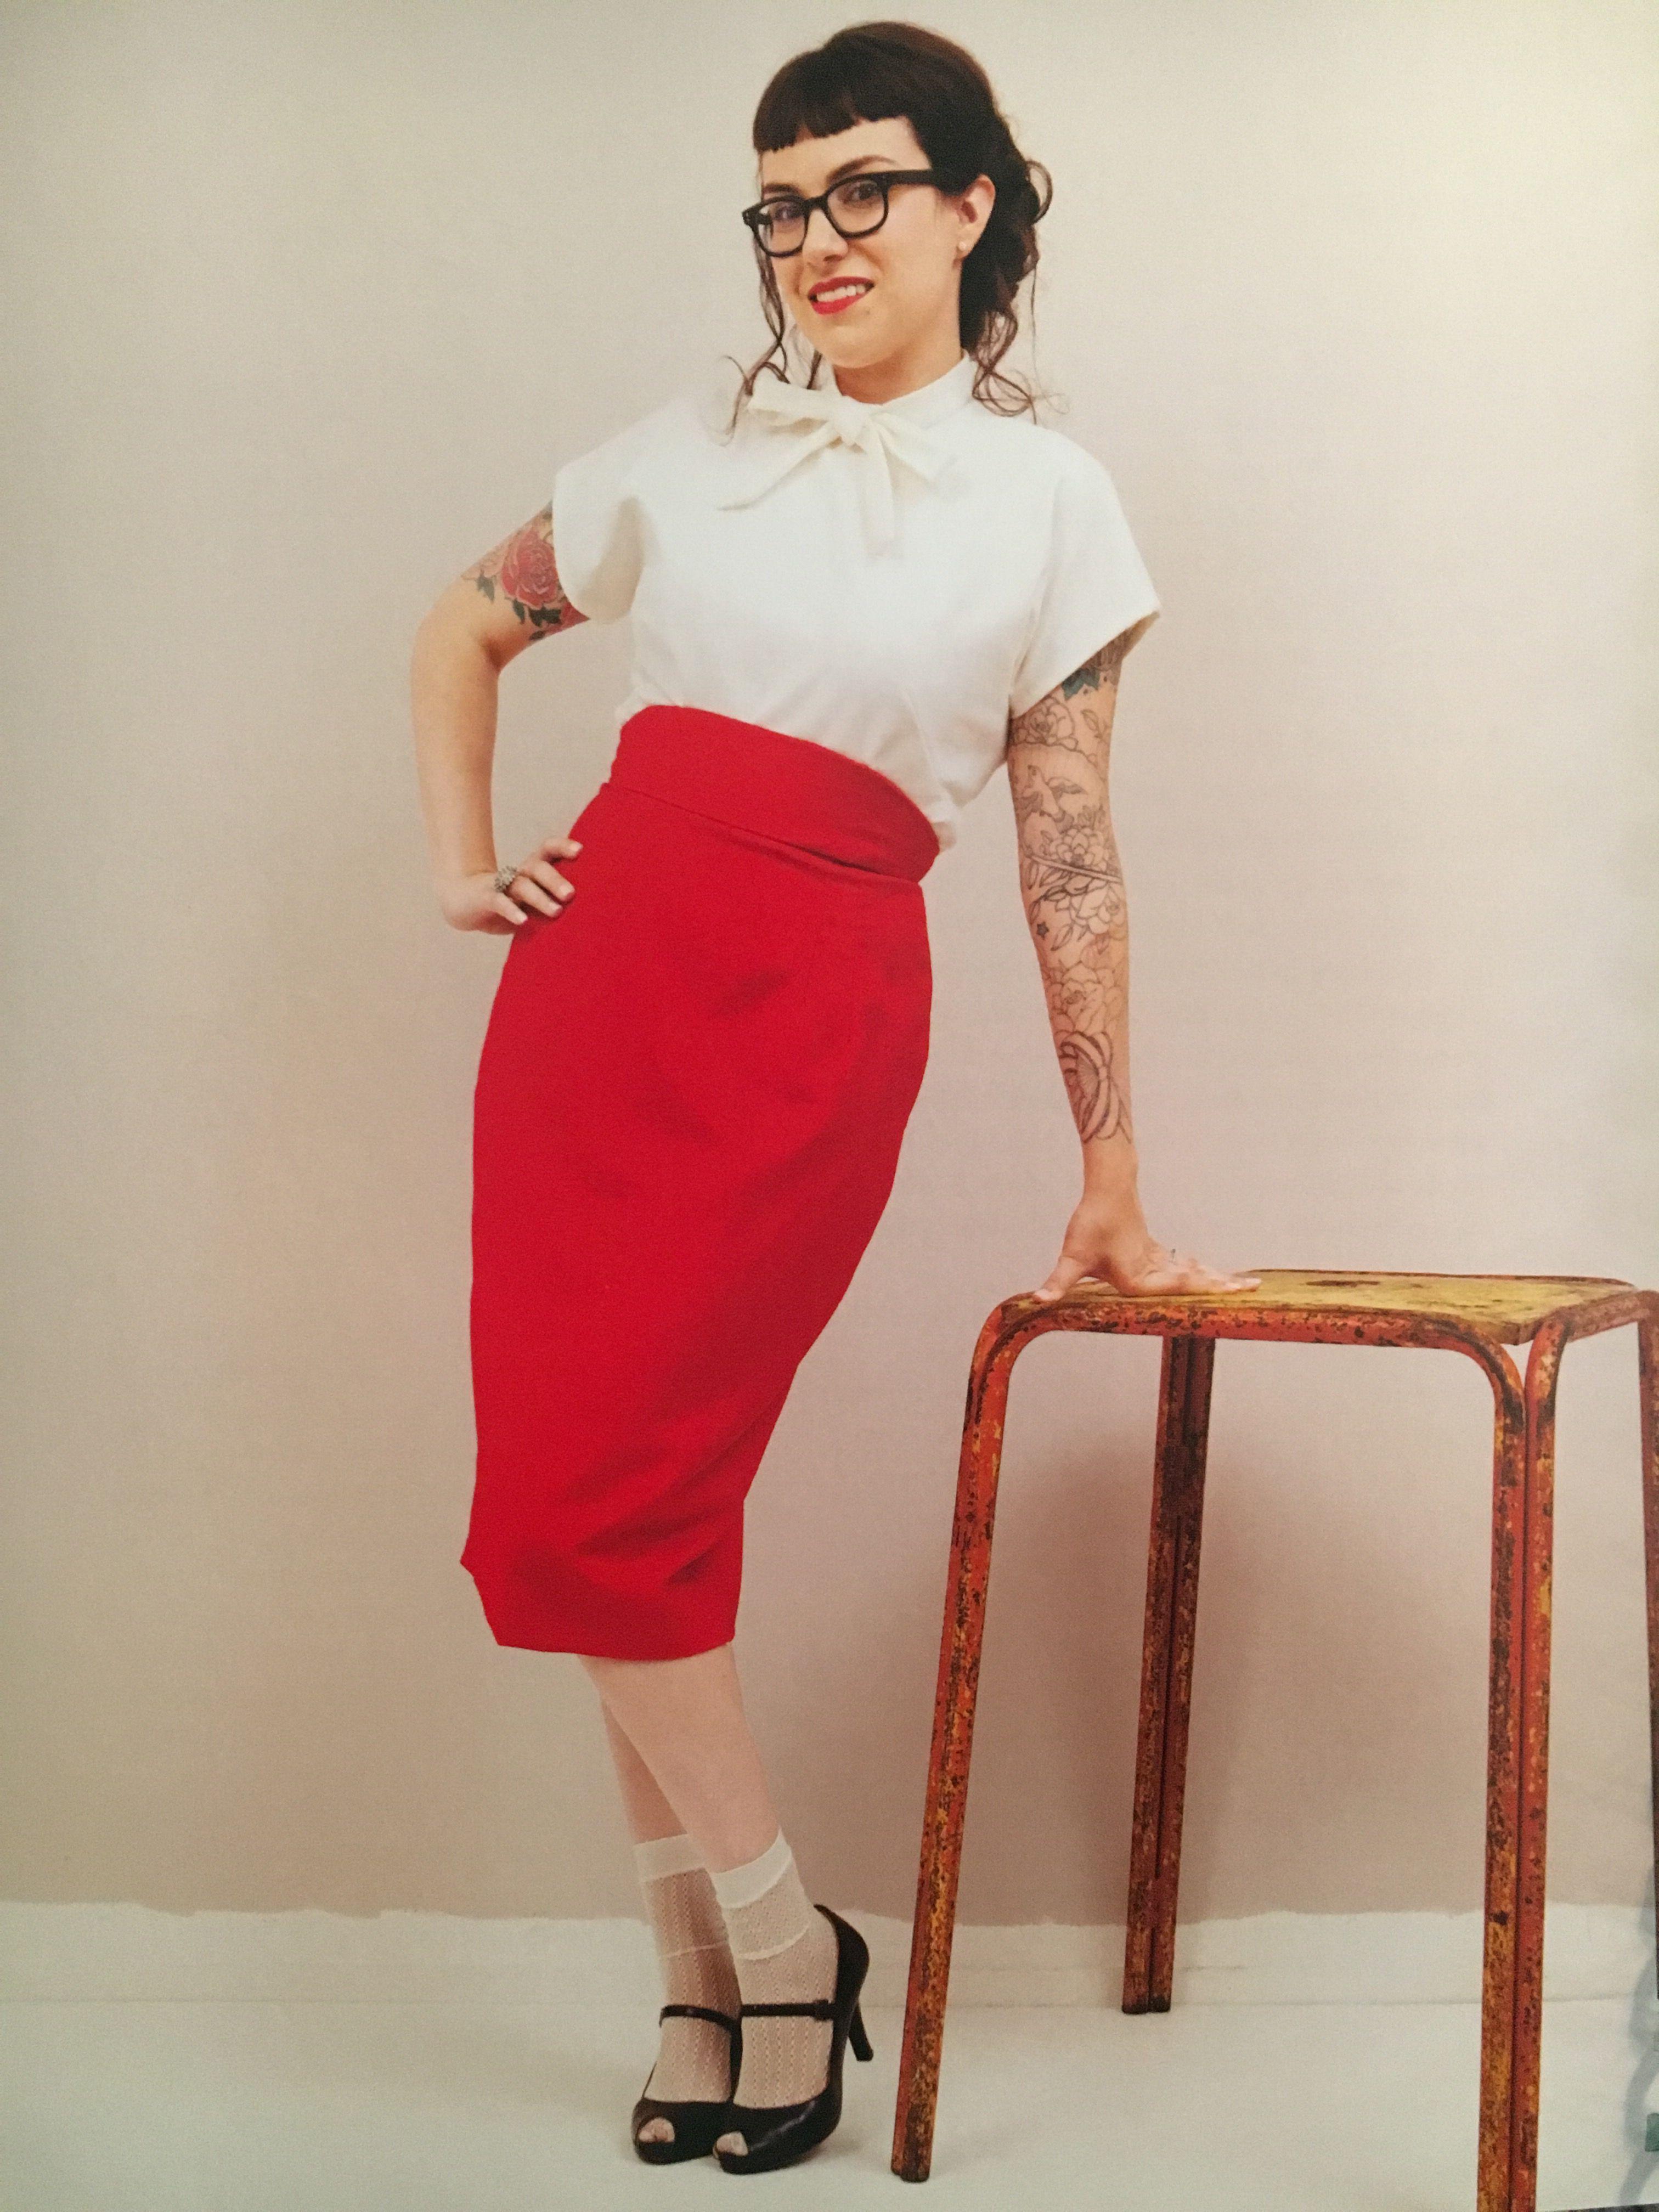 Gertie NBfBS-The Pencil Skirt-1 yard underlining (optional), 1 yard ...